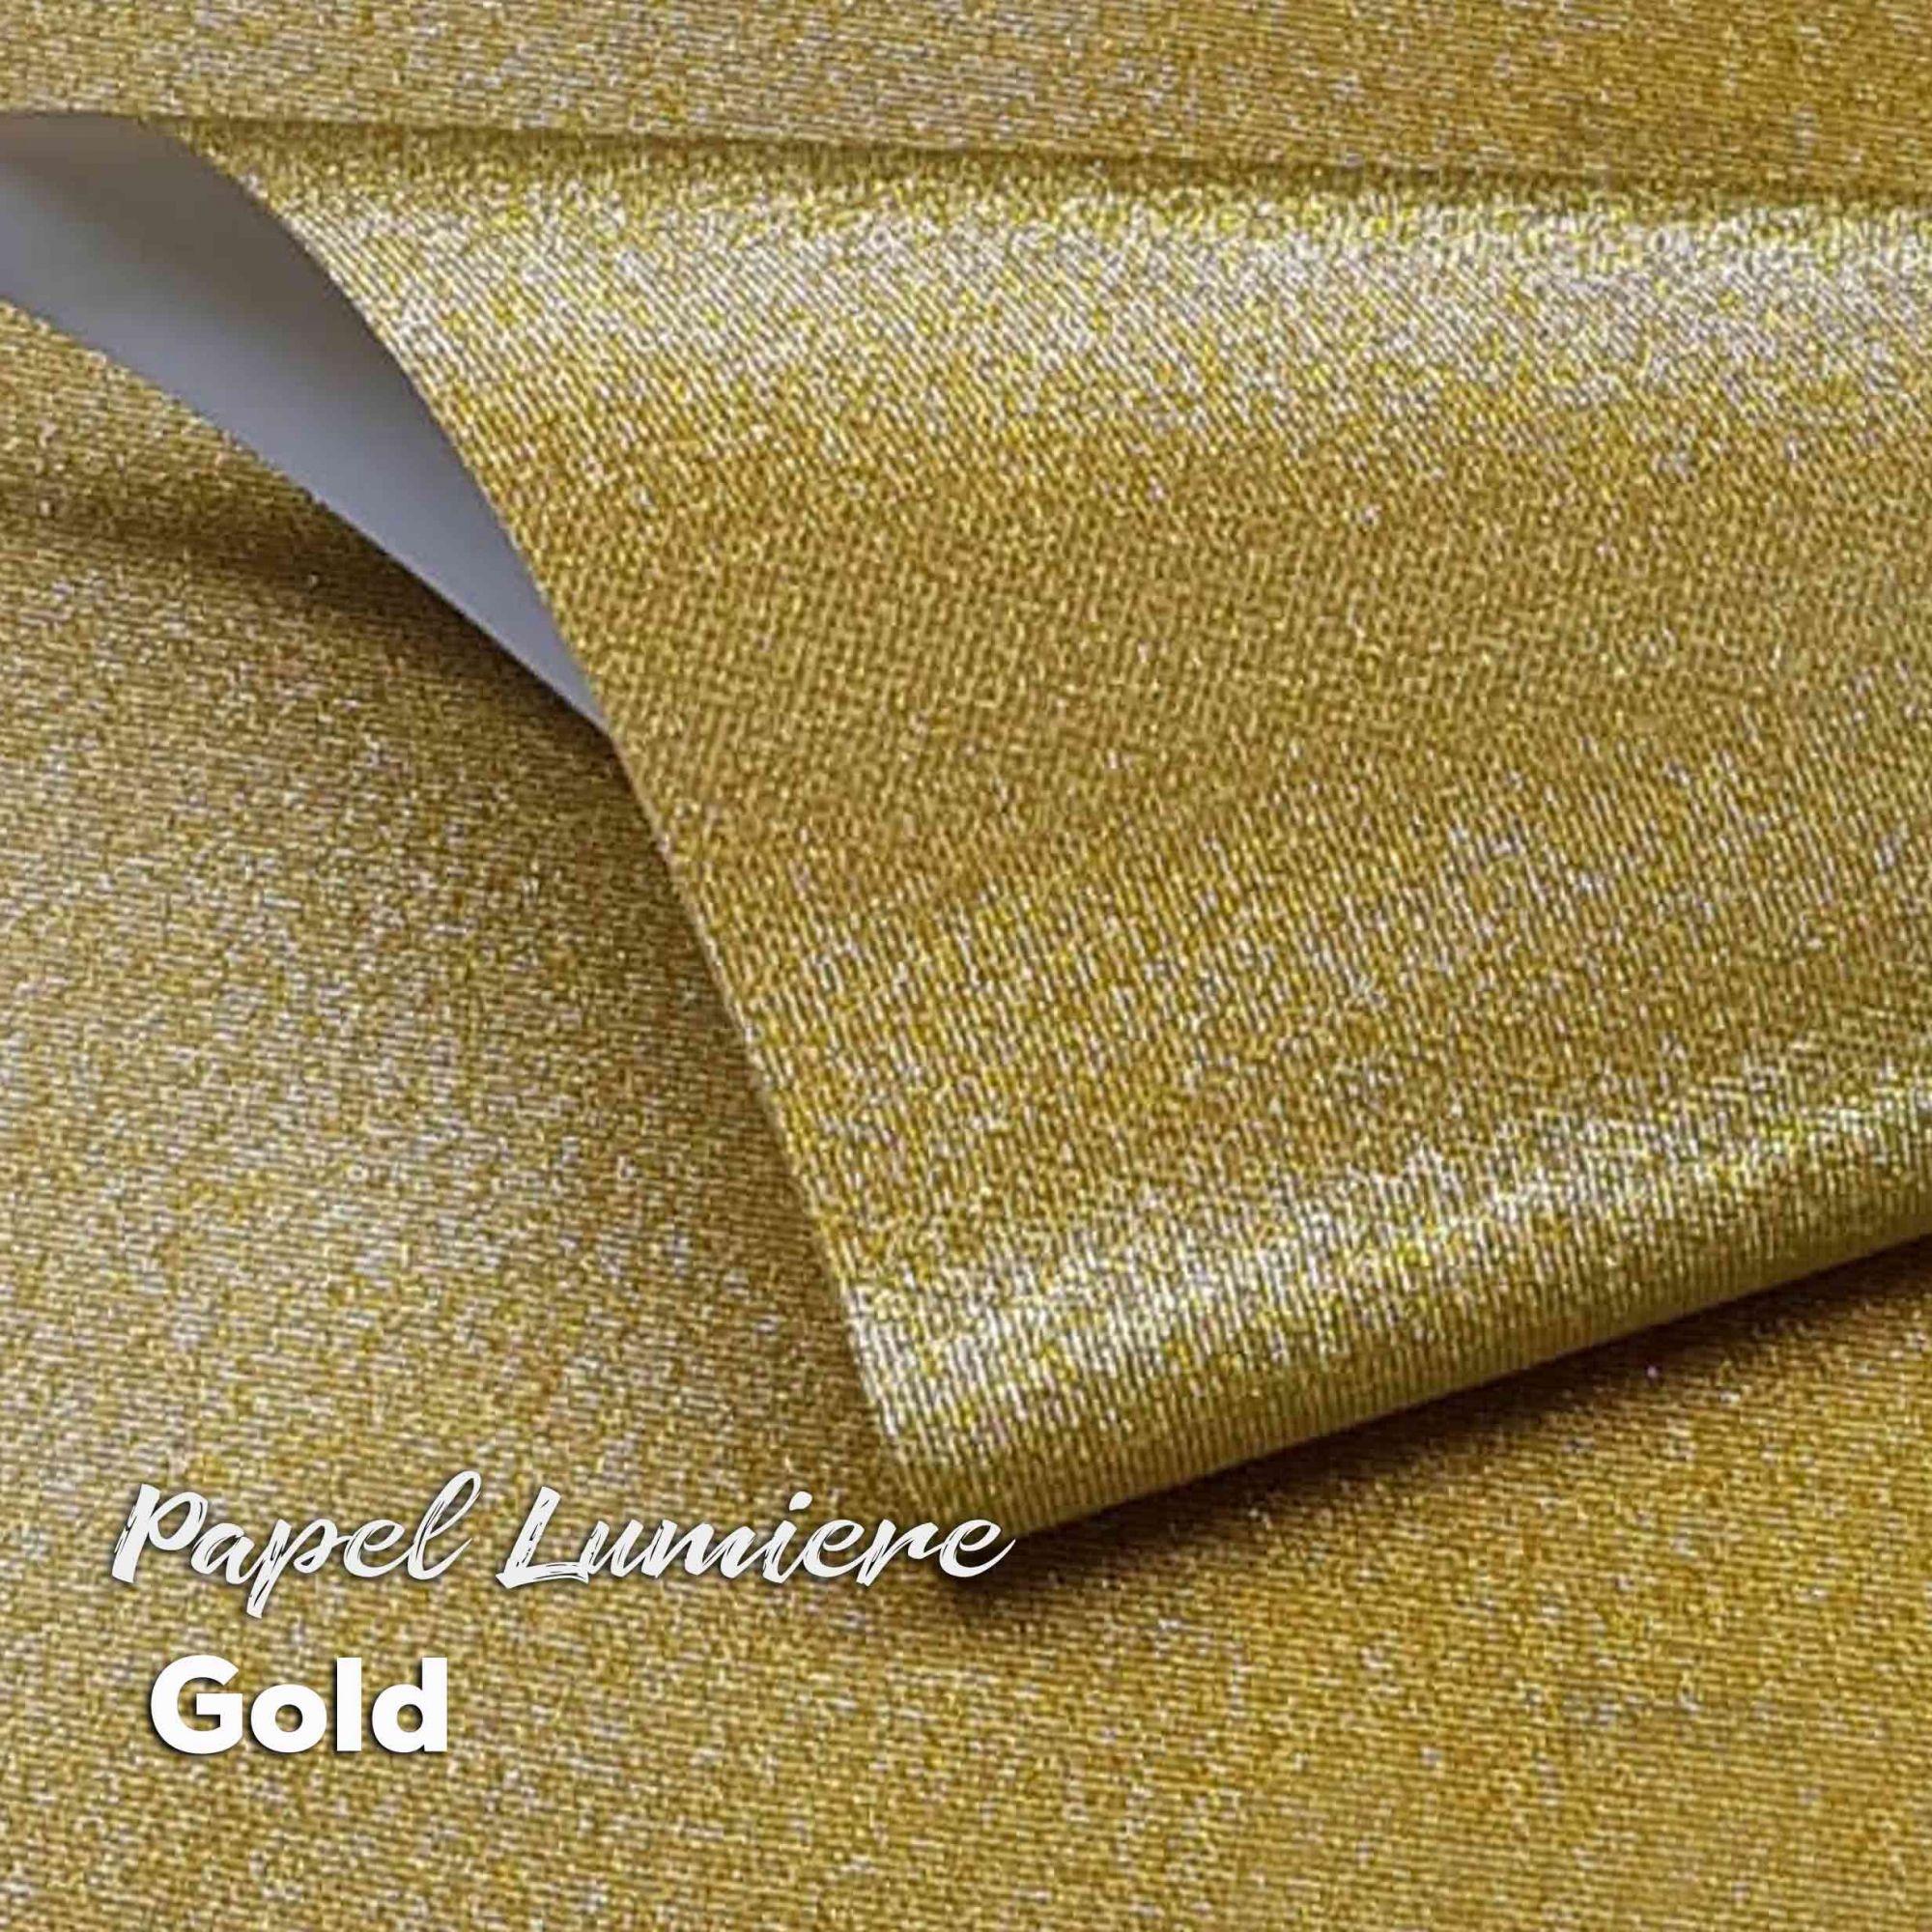 Papel Glitter Lumiere Gold 150g - Ouro 30,5x30,5cm com 6 folhas